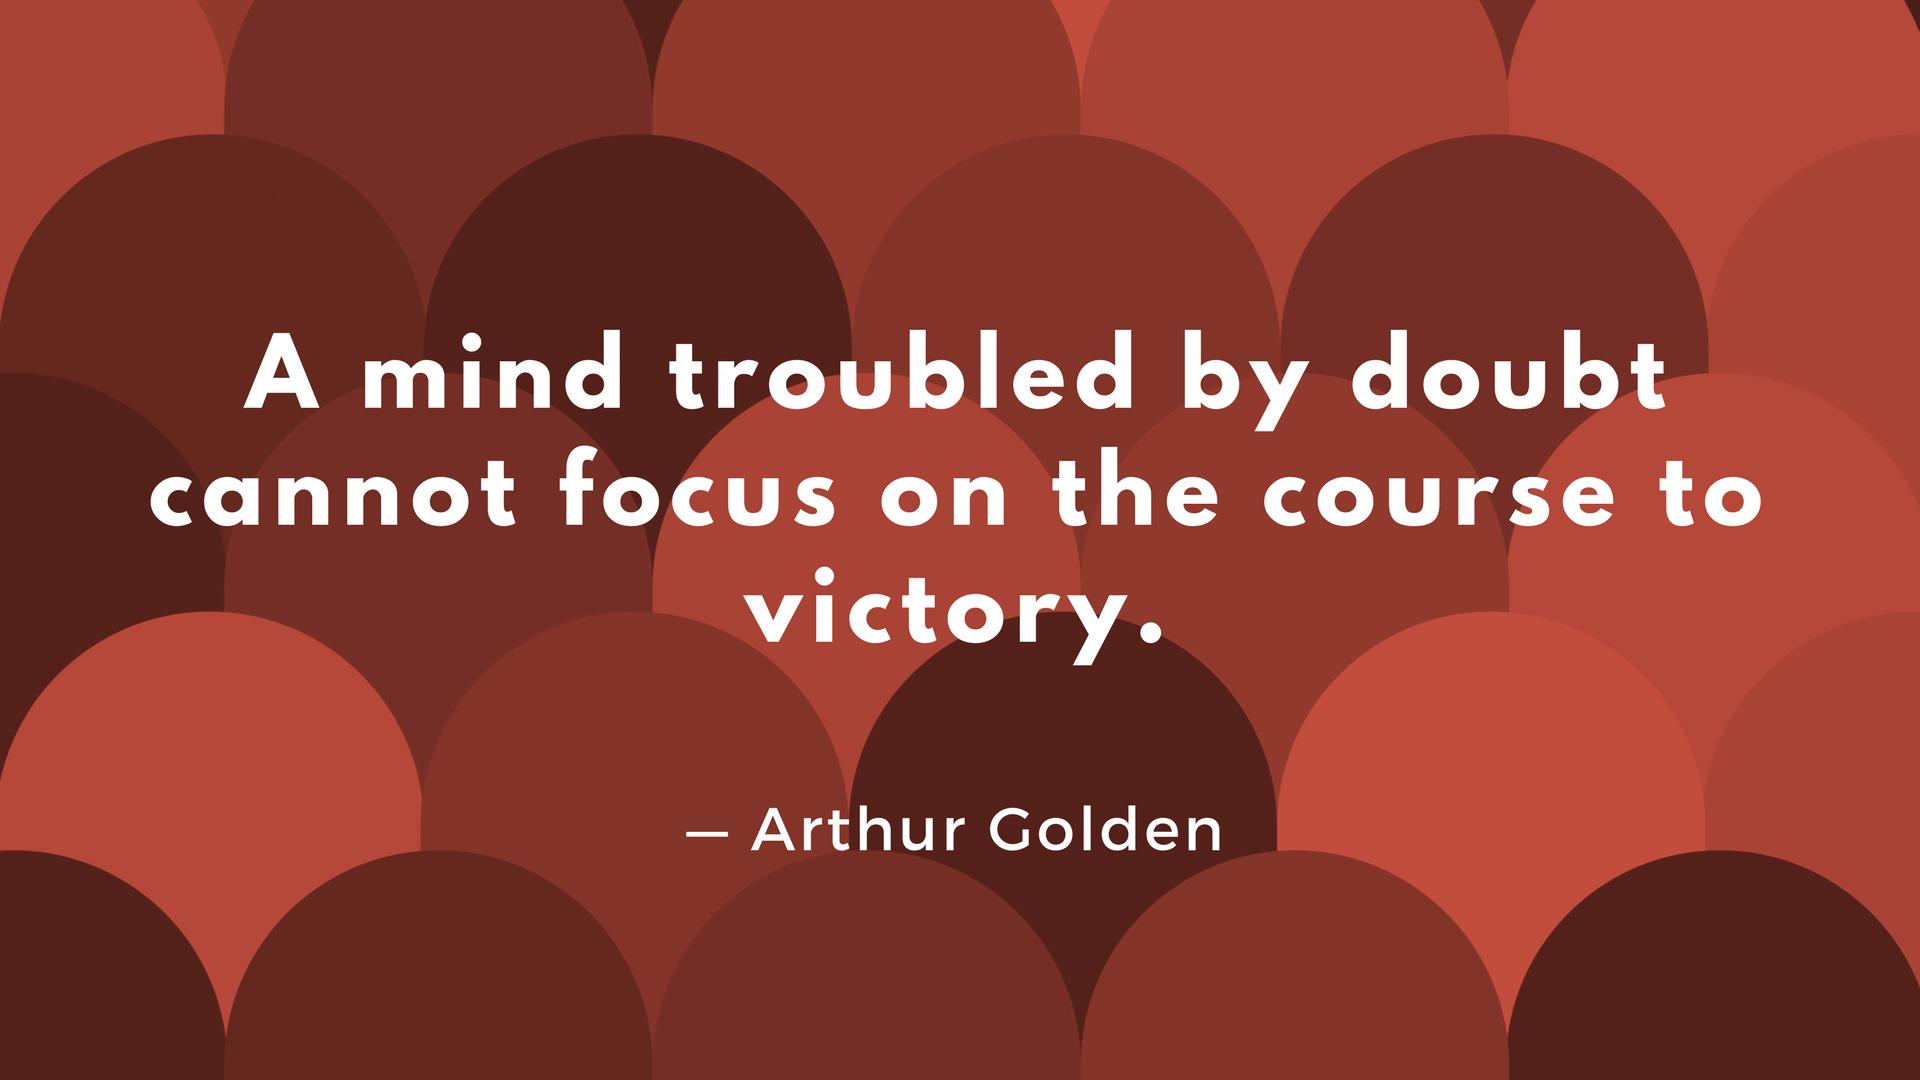 Arthur Golden quote